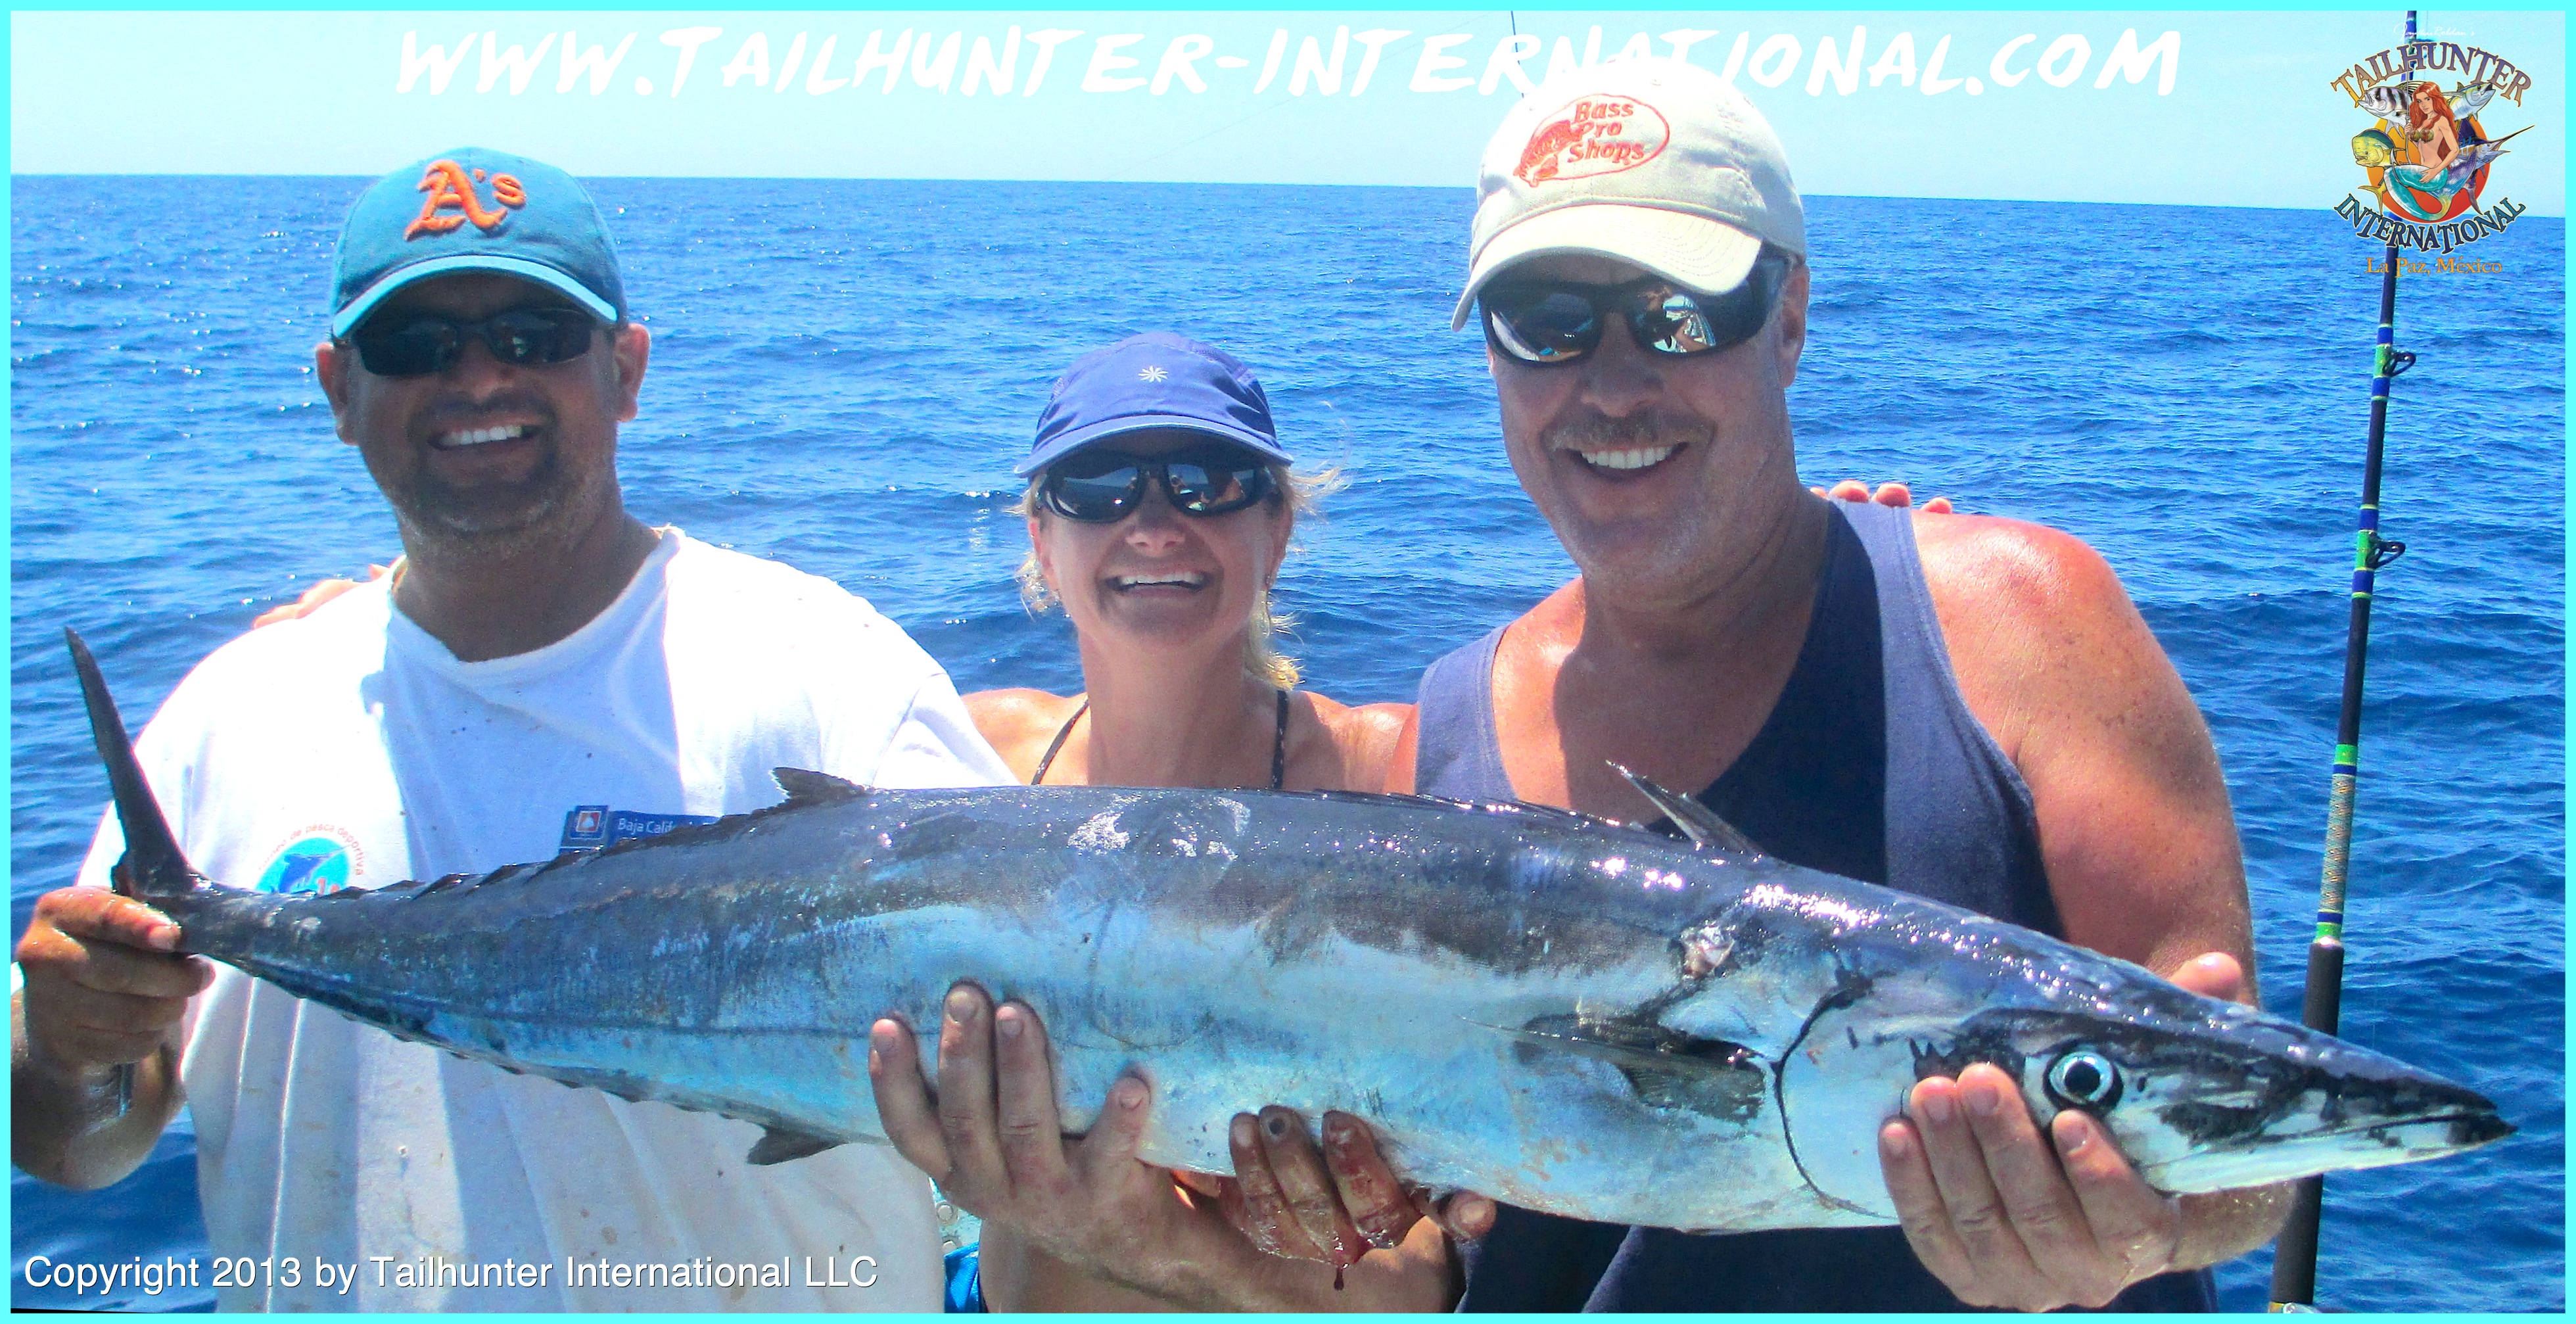 La paz las arenas fishing report from tailhunter for Santa barbara fishing report